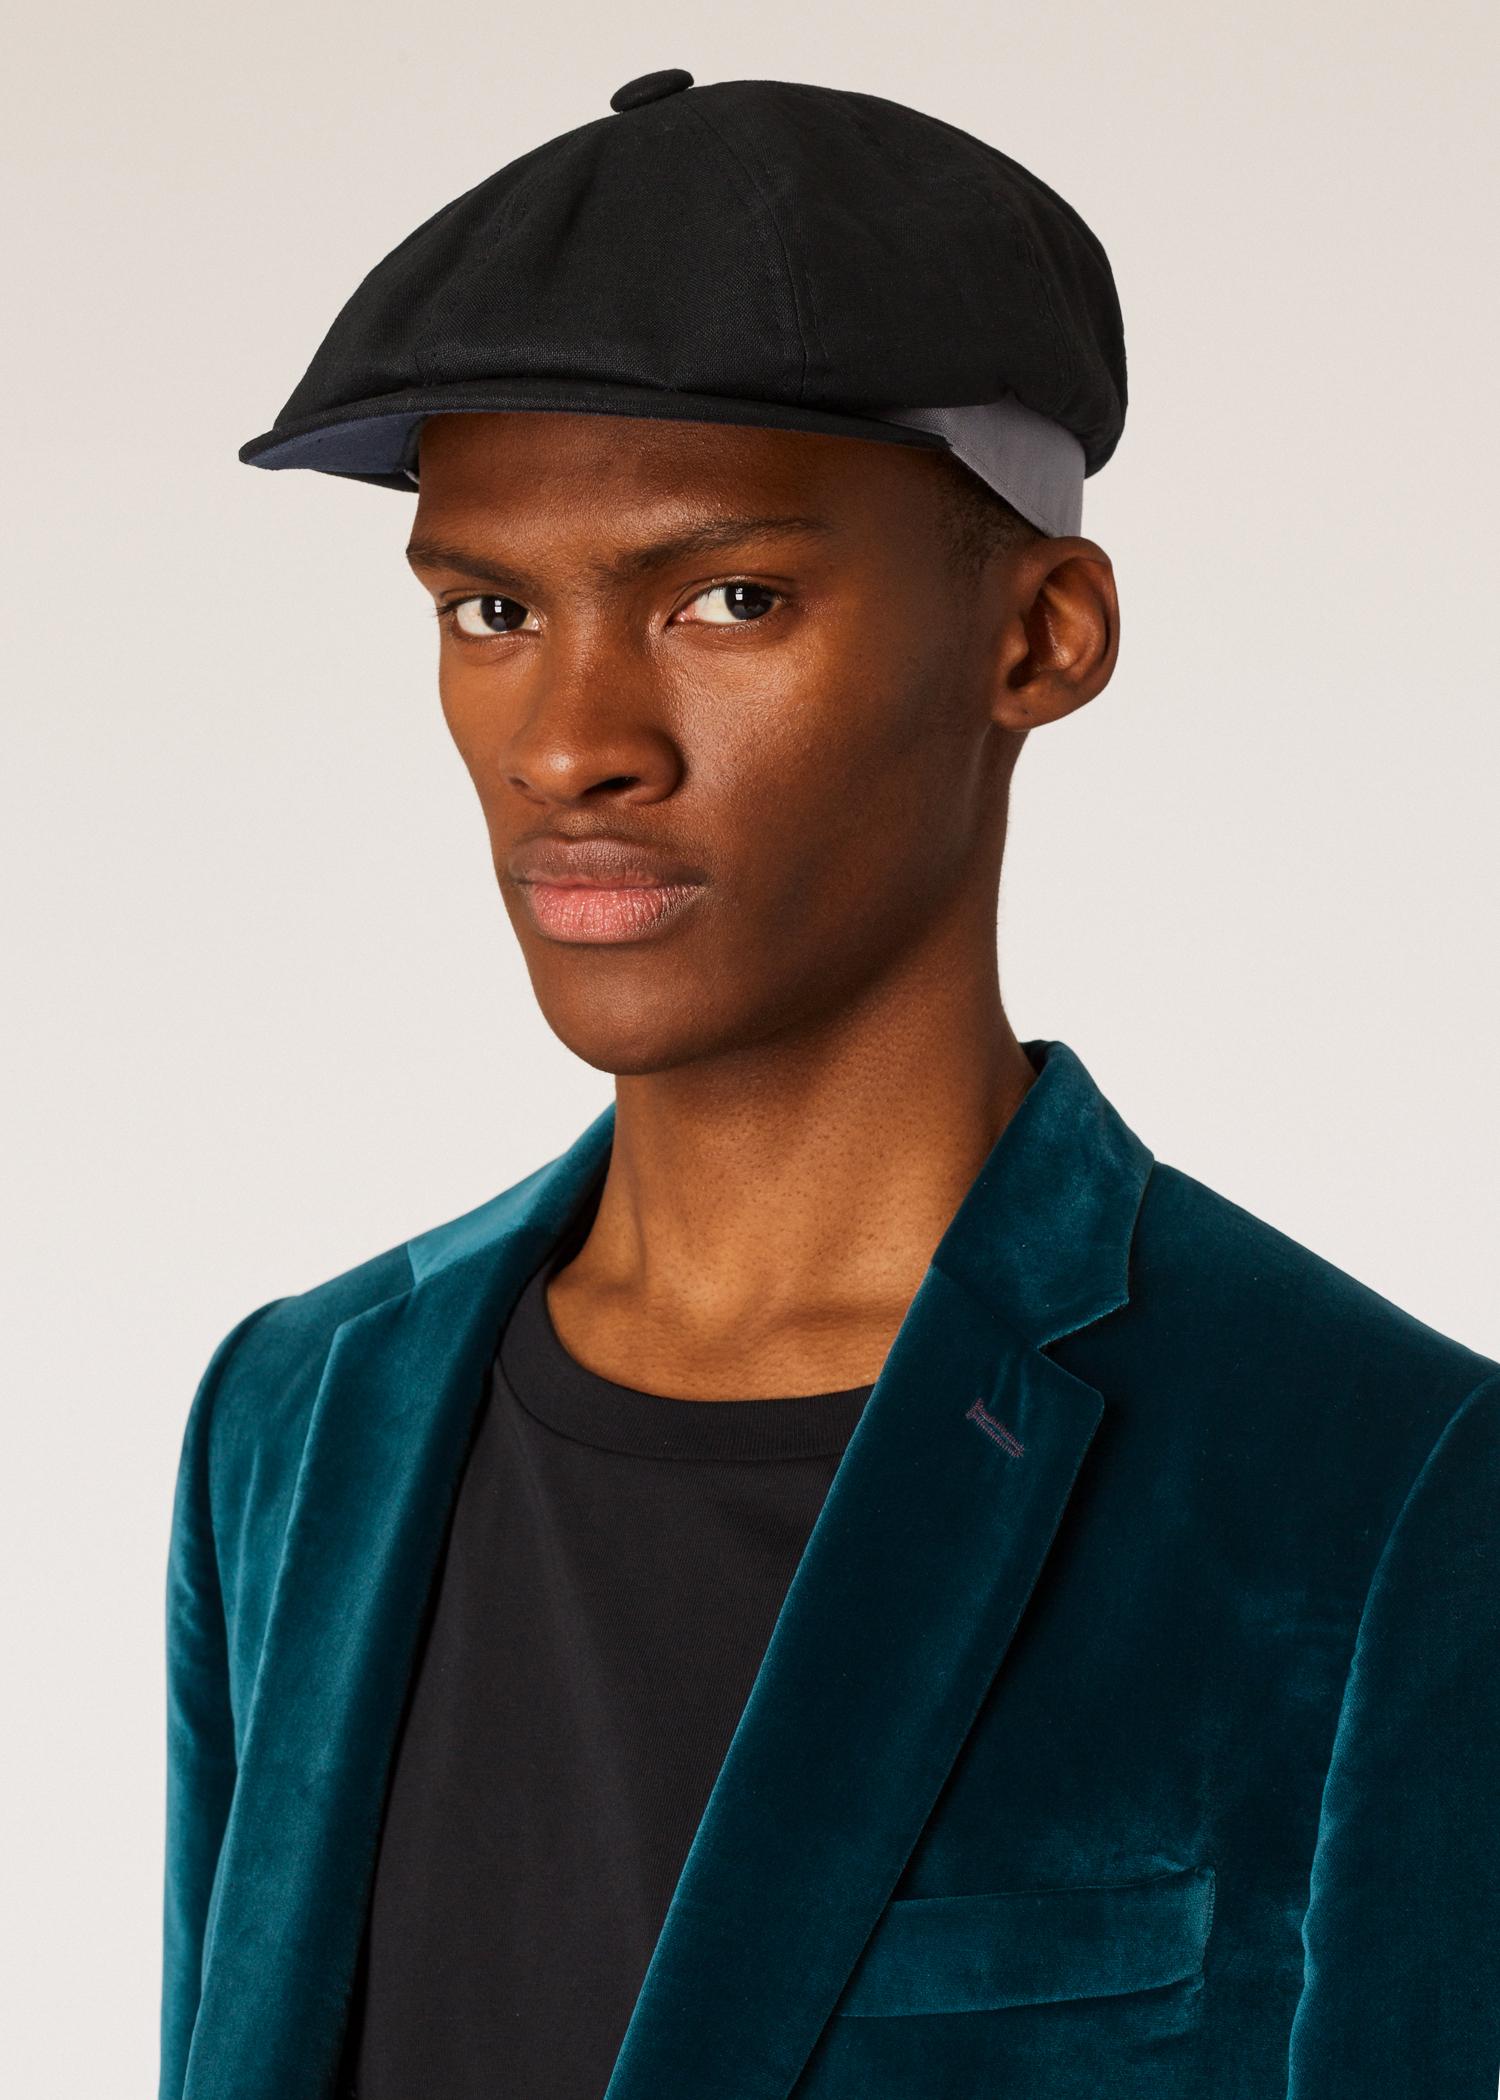 7b682f94 Model view - Men's Black Linen Flat Cap Paul Smith